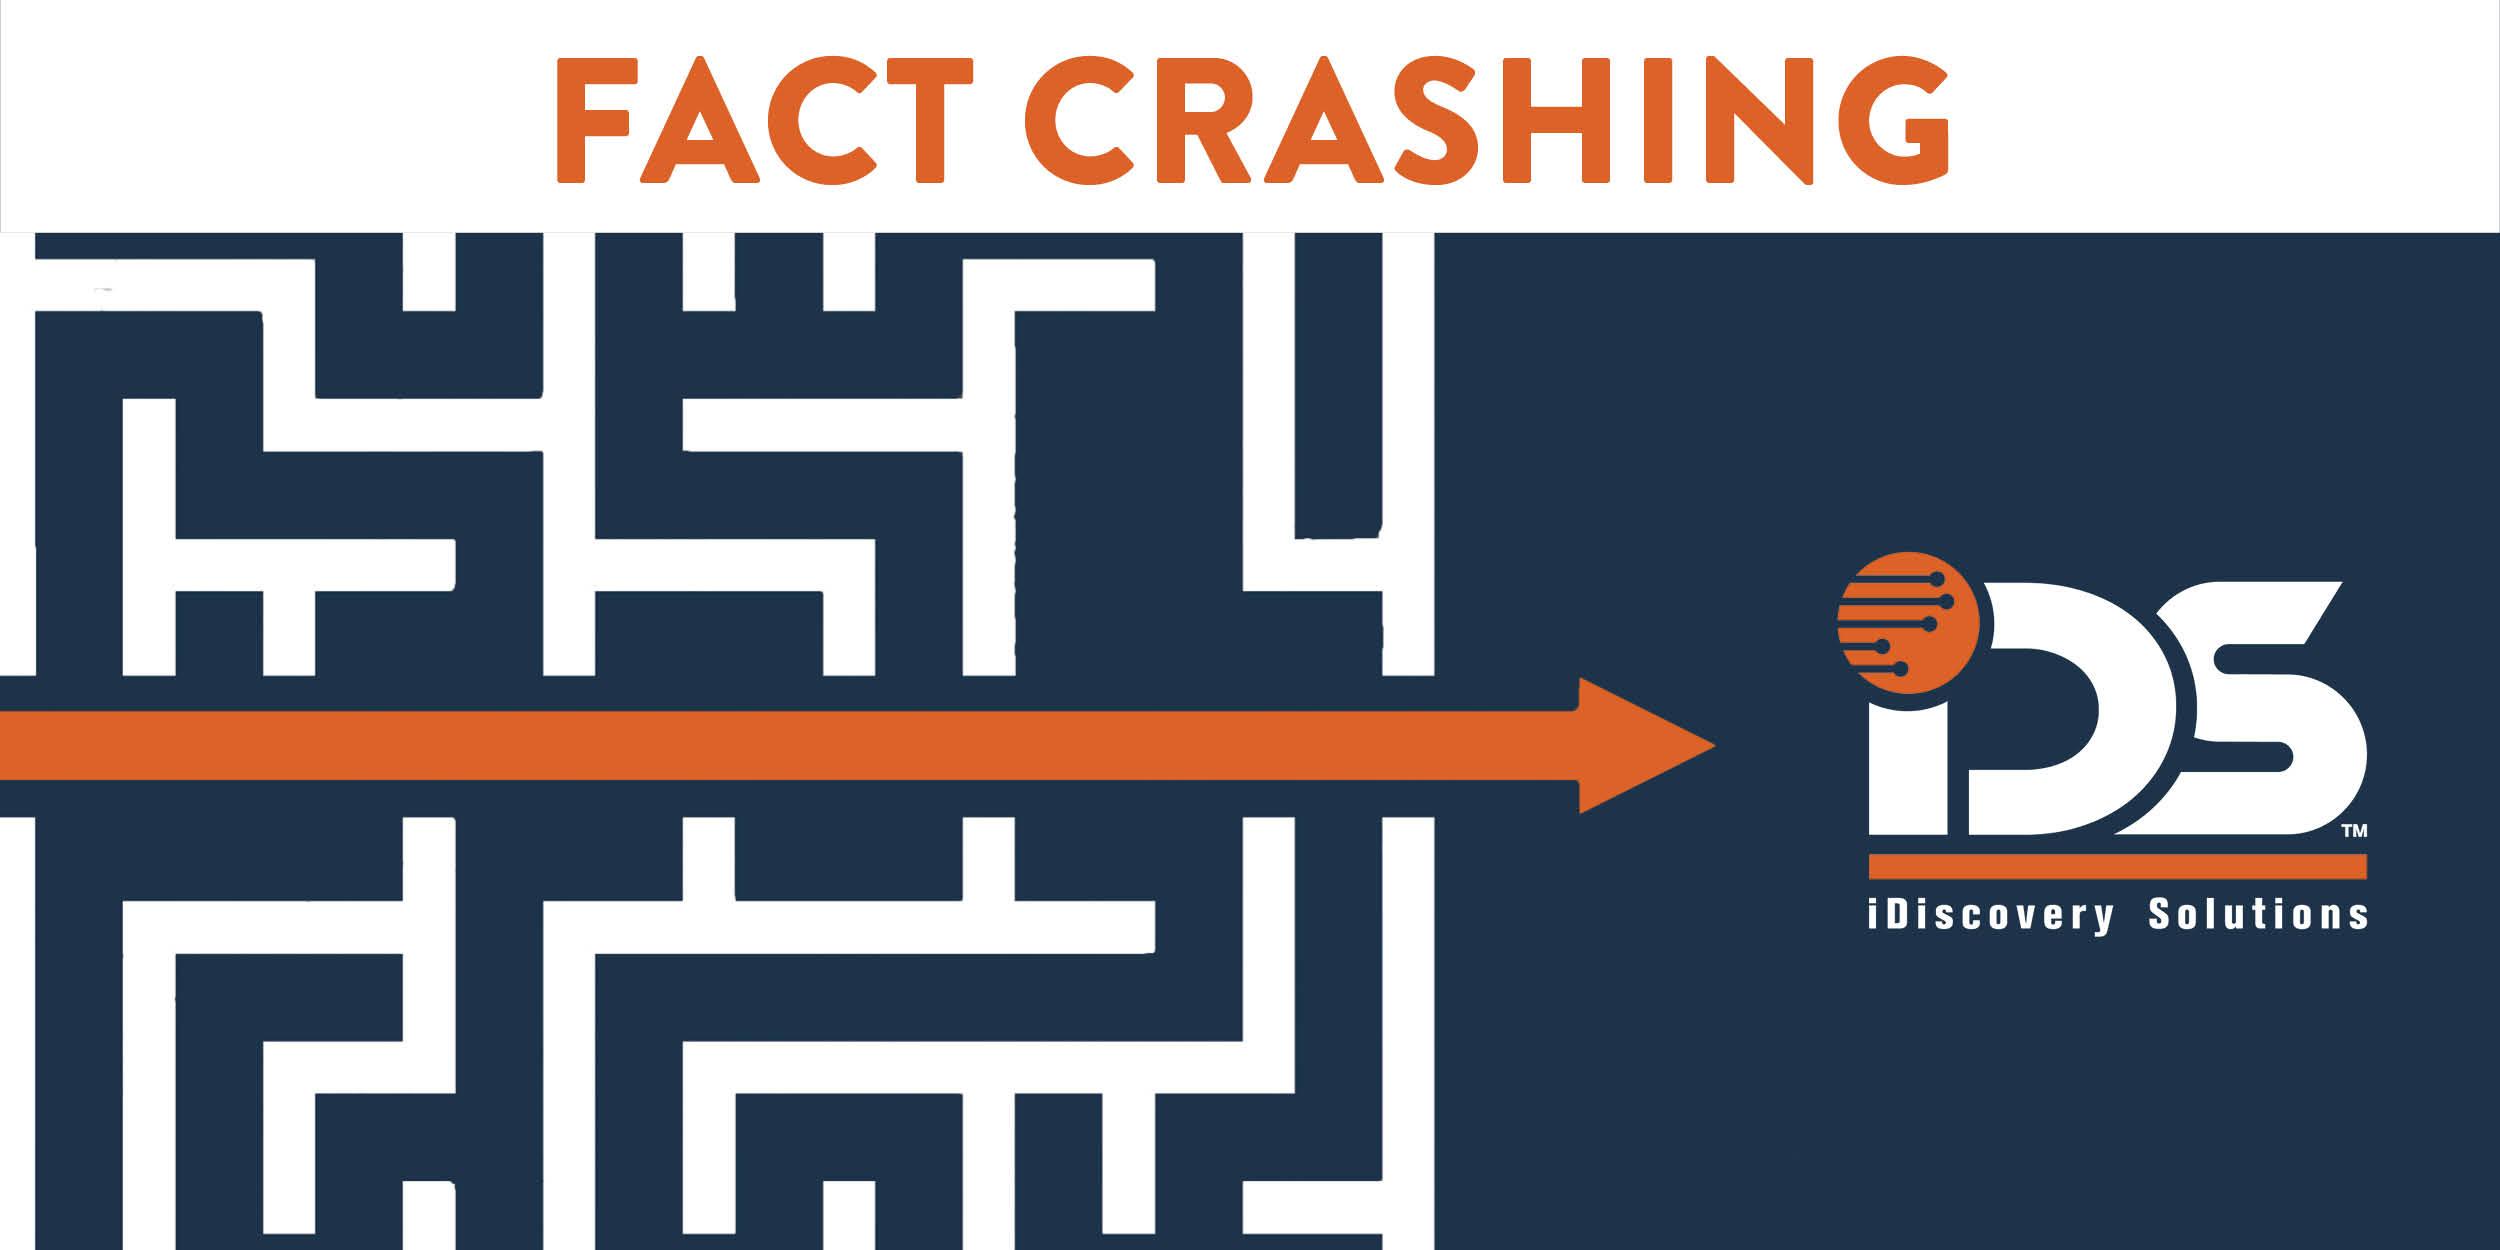 Fact Crashing™, Fact Crashing™ Blog, iDiscovery solutions, eDiscovery, Structured Data